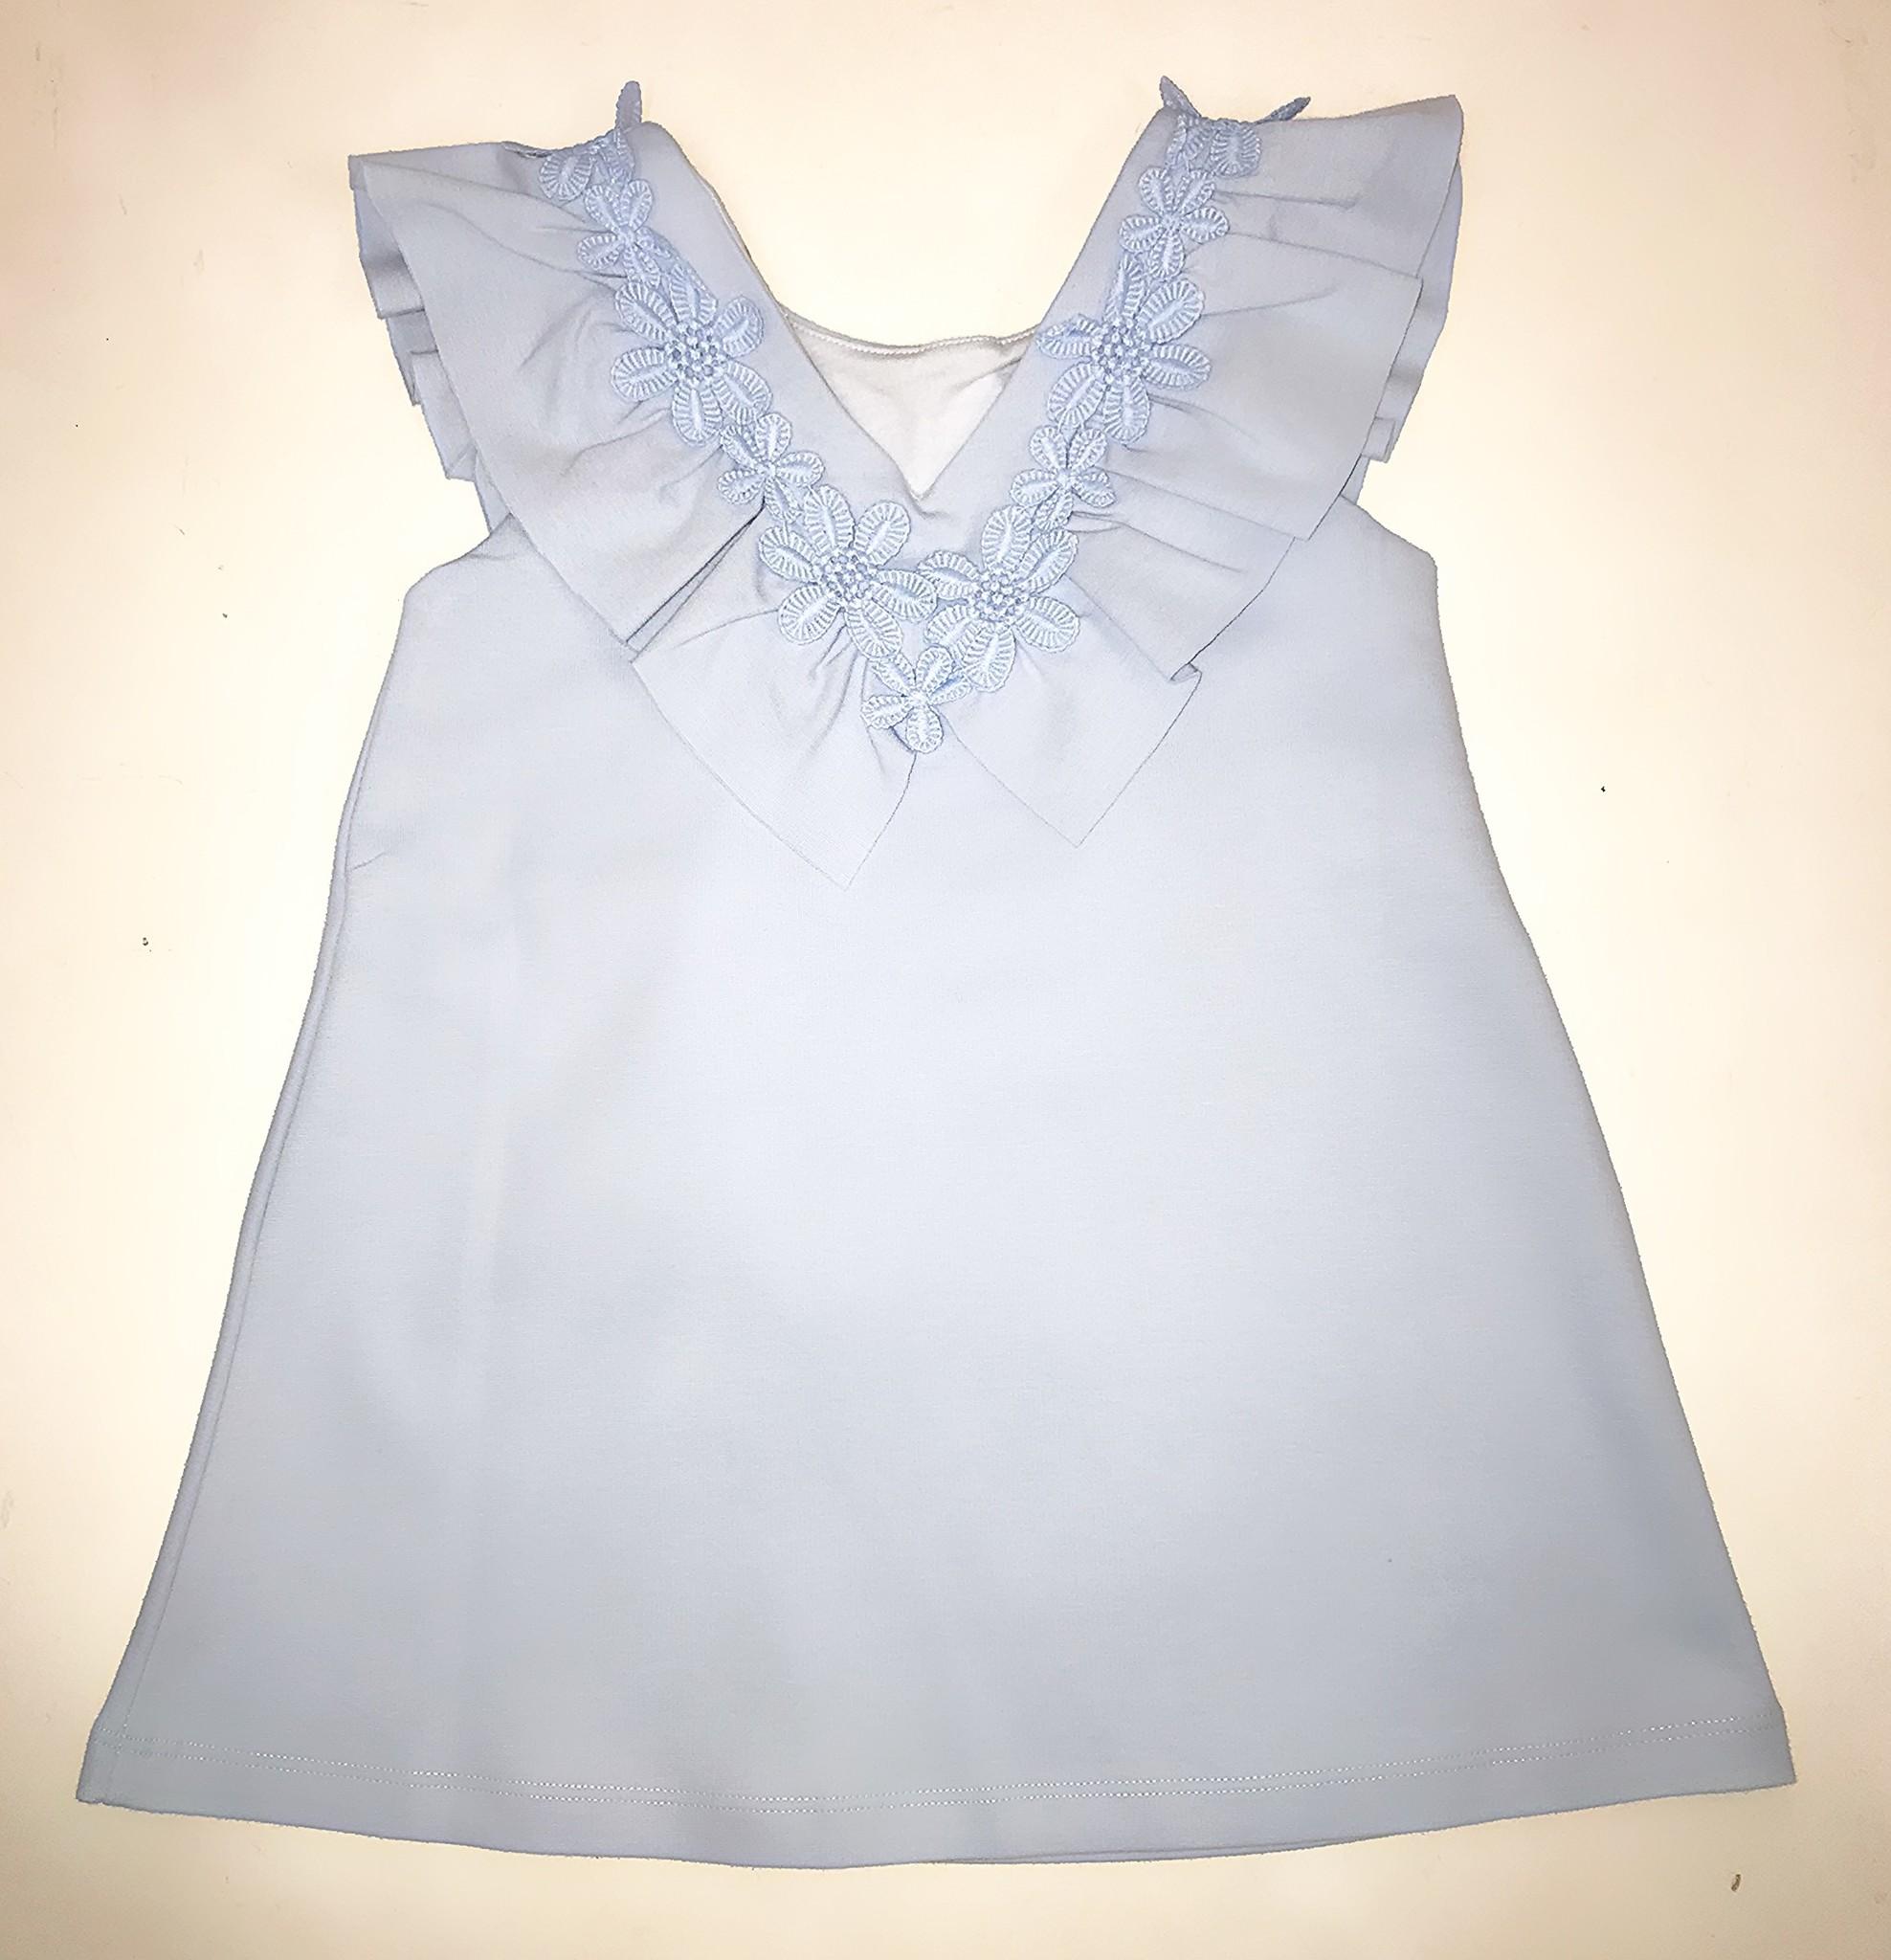 Patachou Patachou Girls 410 Pale Blue Flower Motif Dress